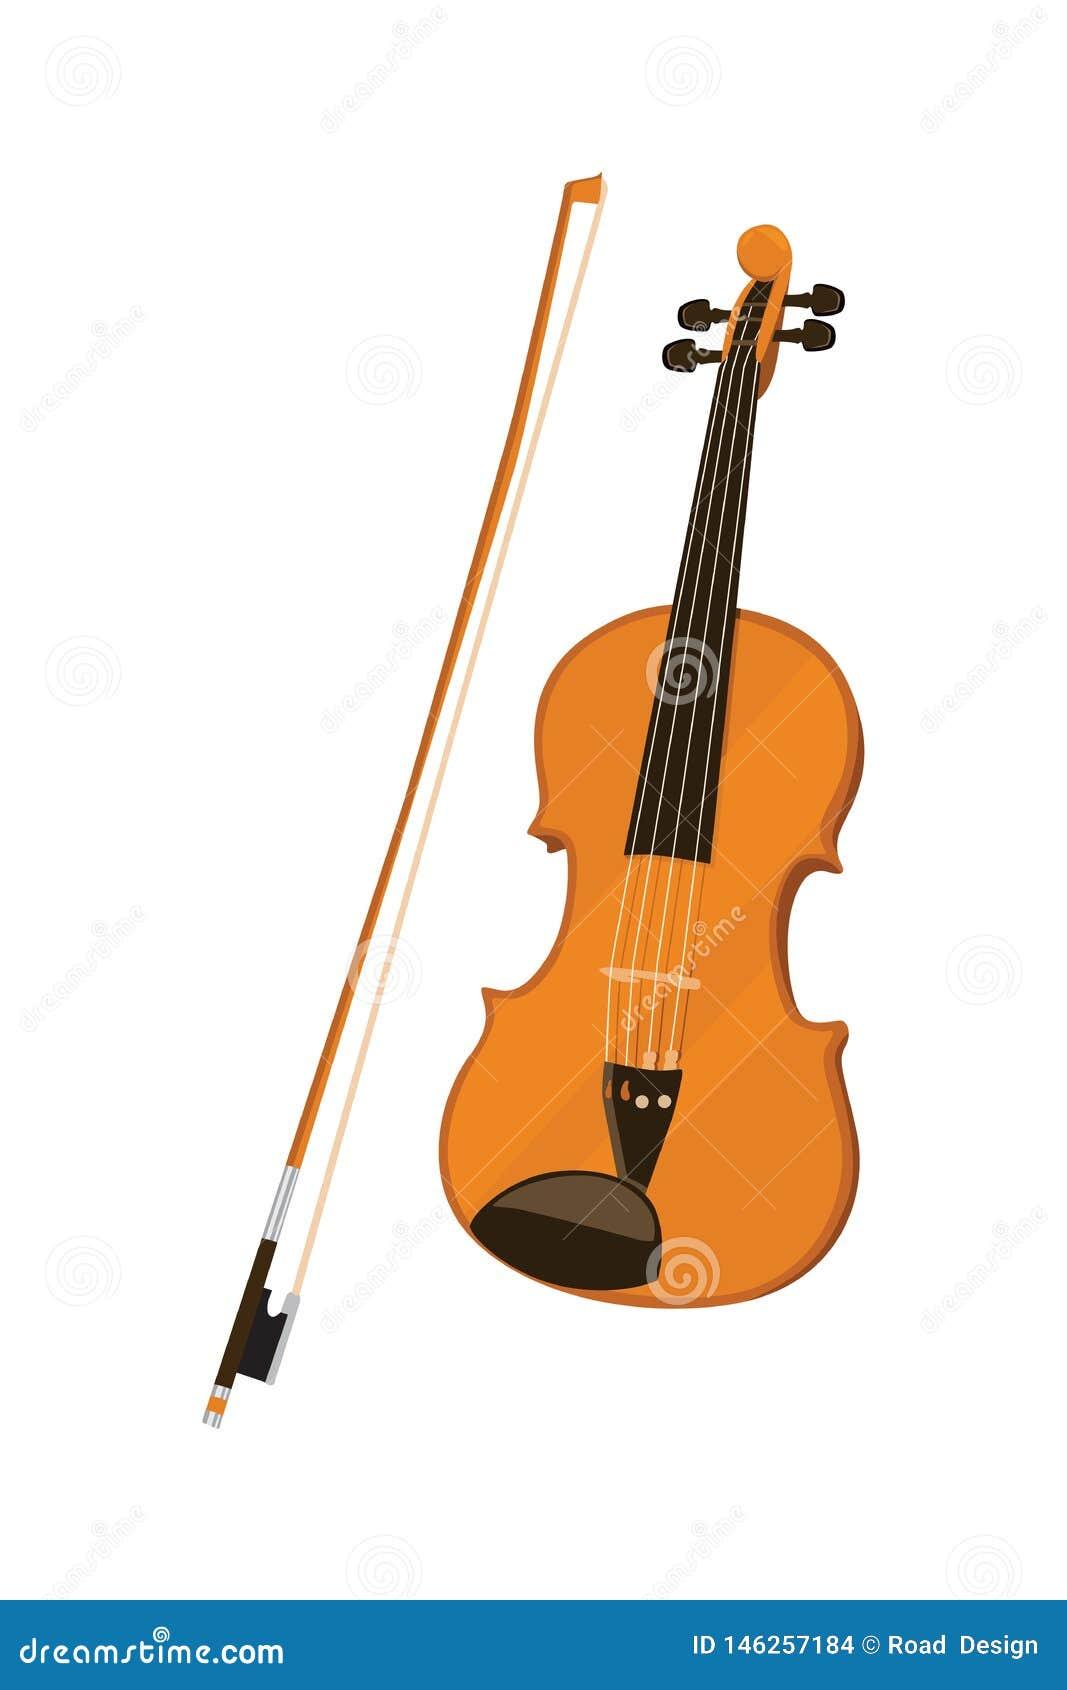 Vetor Illusrtration do instrumento do violino